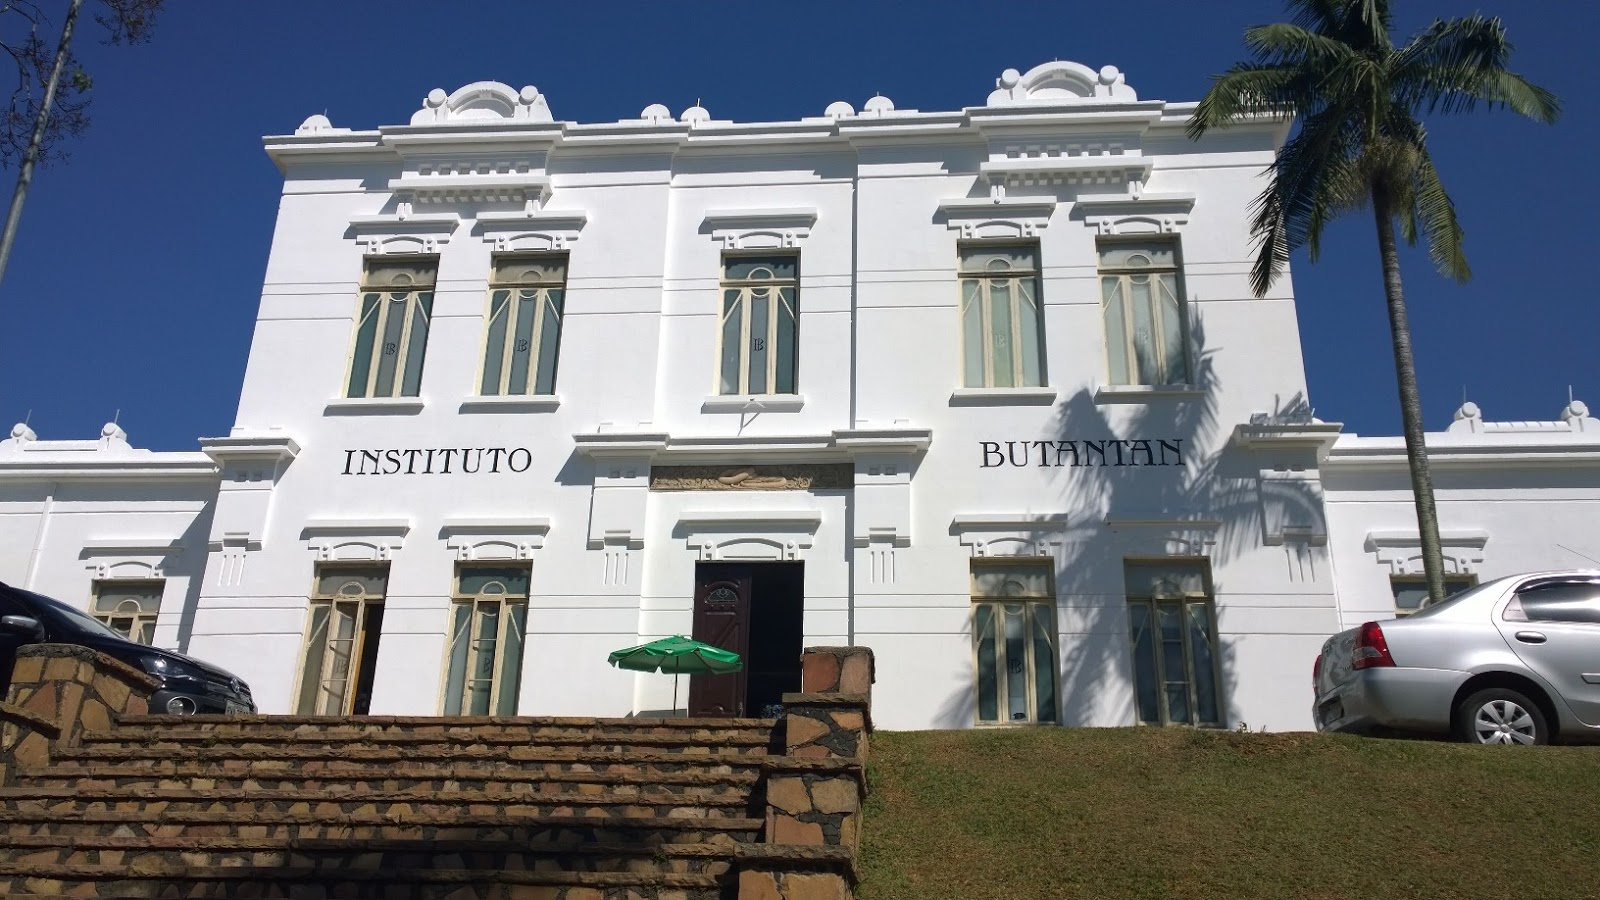 Butatan, Brasil: la vacuna Sinovac Biotech pareció ser segura